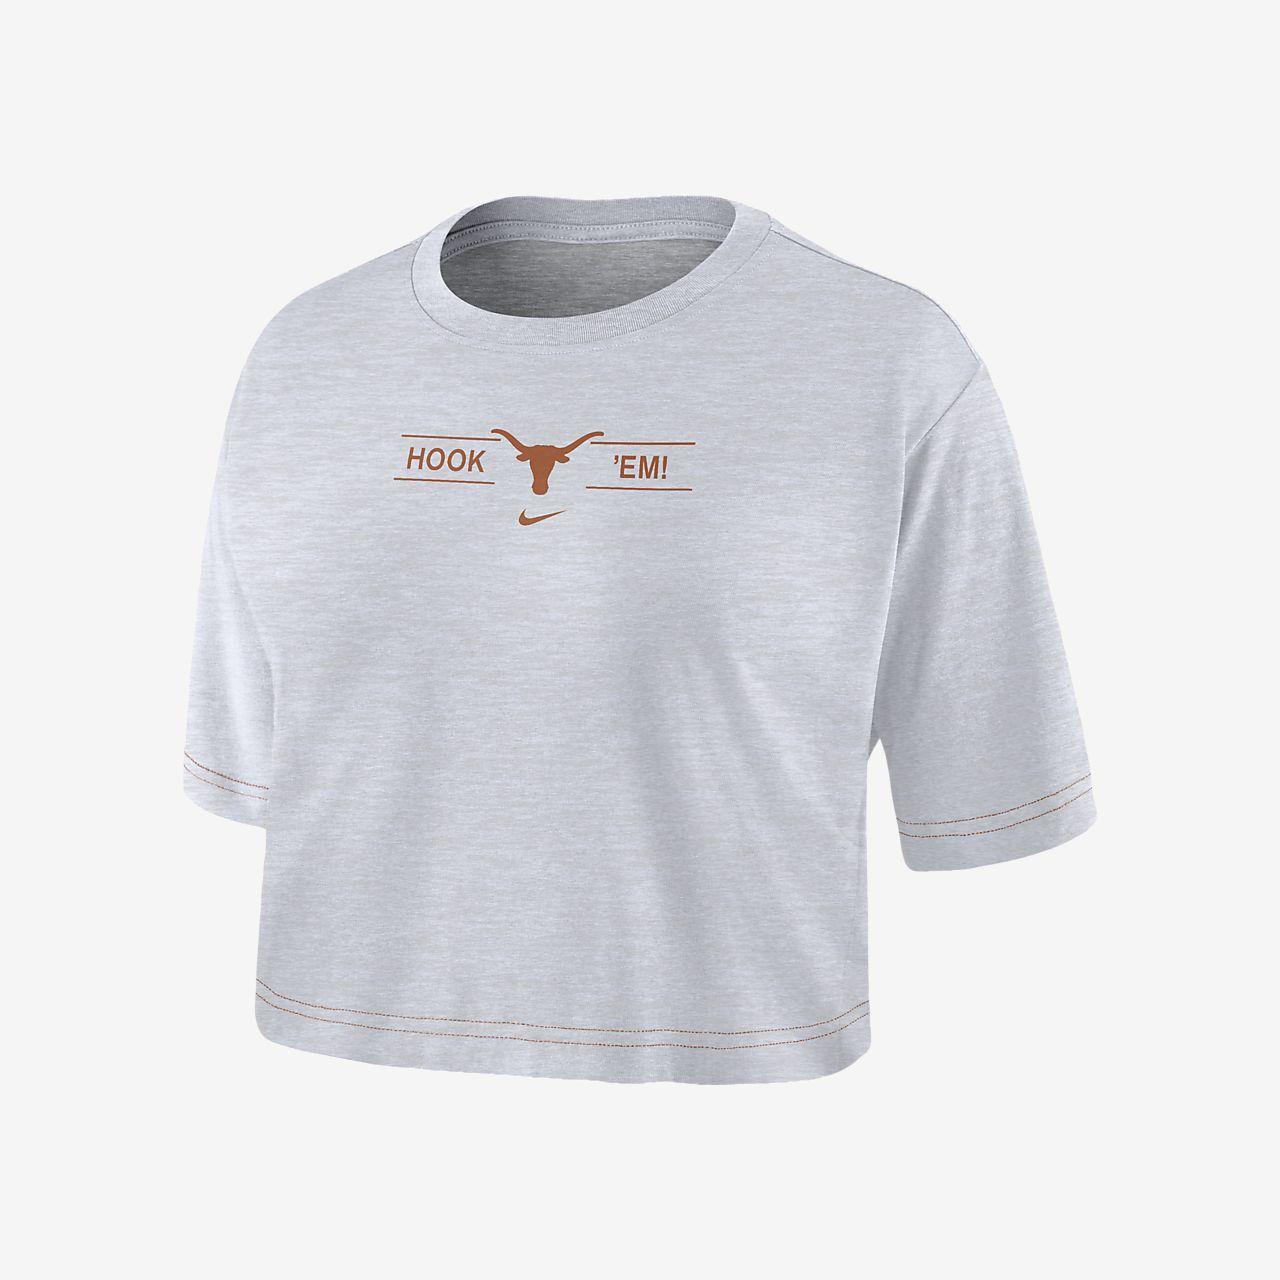 Nike College Dri-FIT (Texas) Women's Cropped T-Shirt